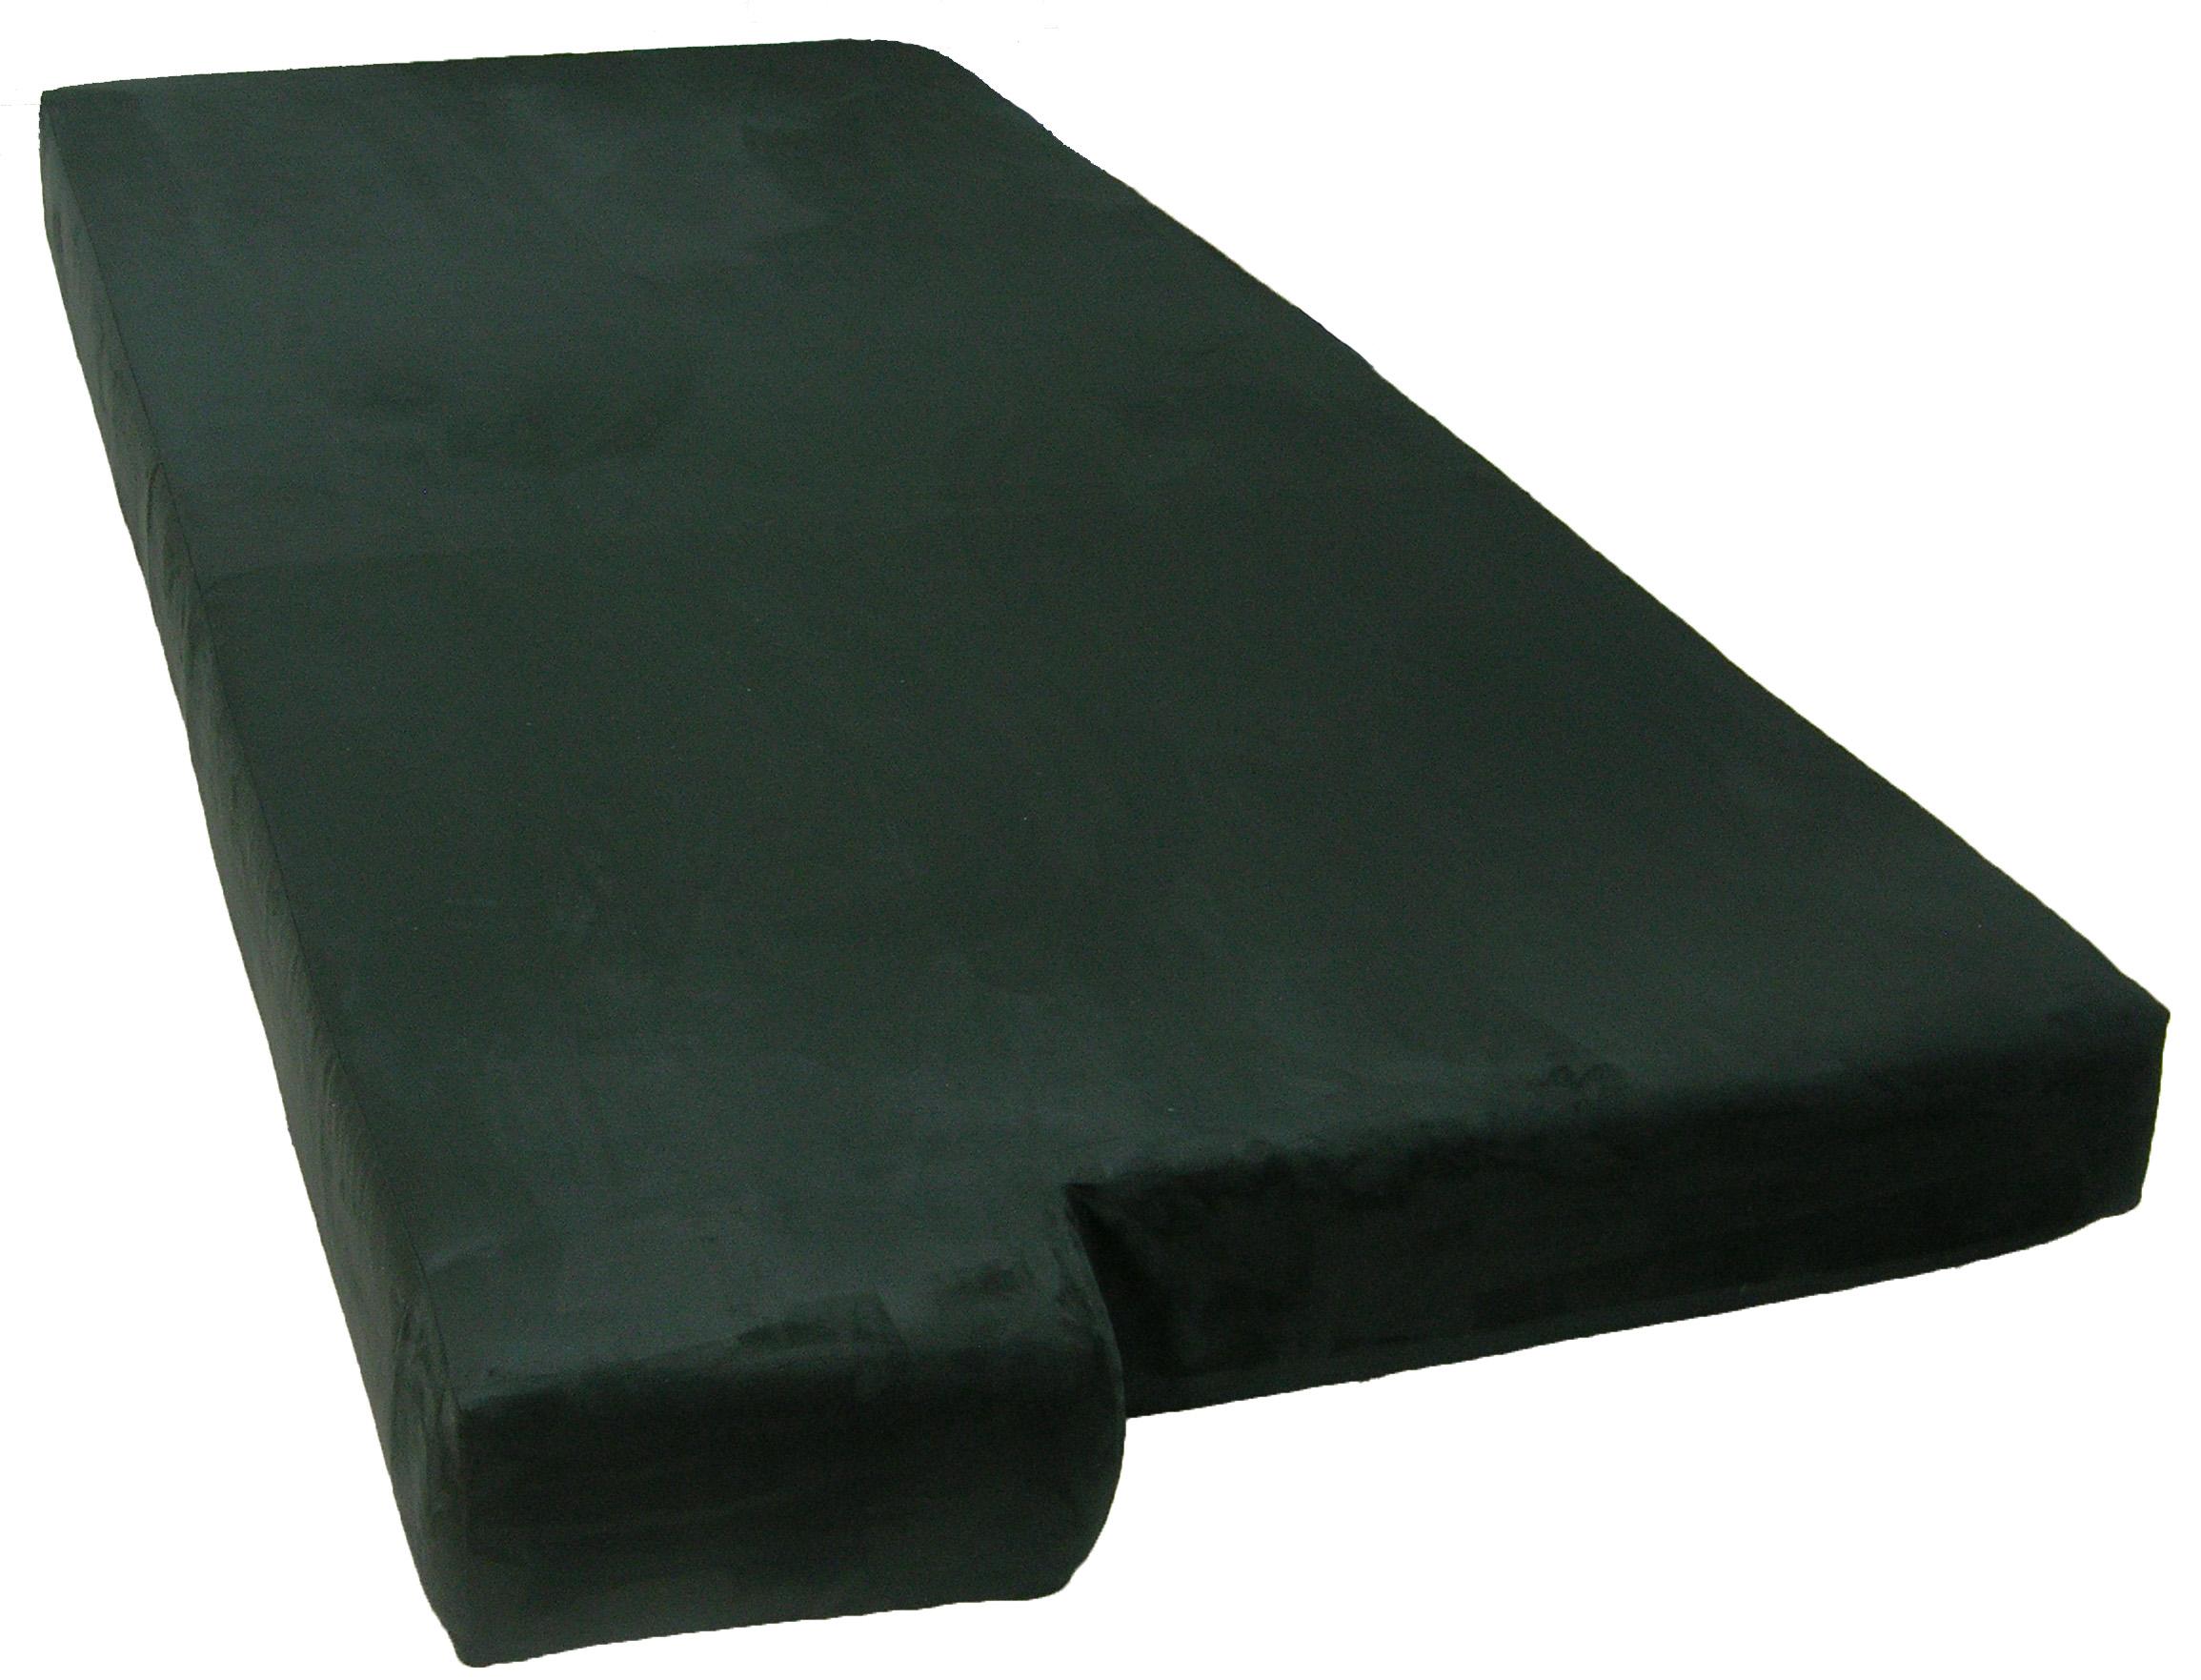 Custom Tempur-Pedic mattress for a custom home bay window